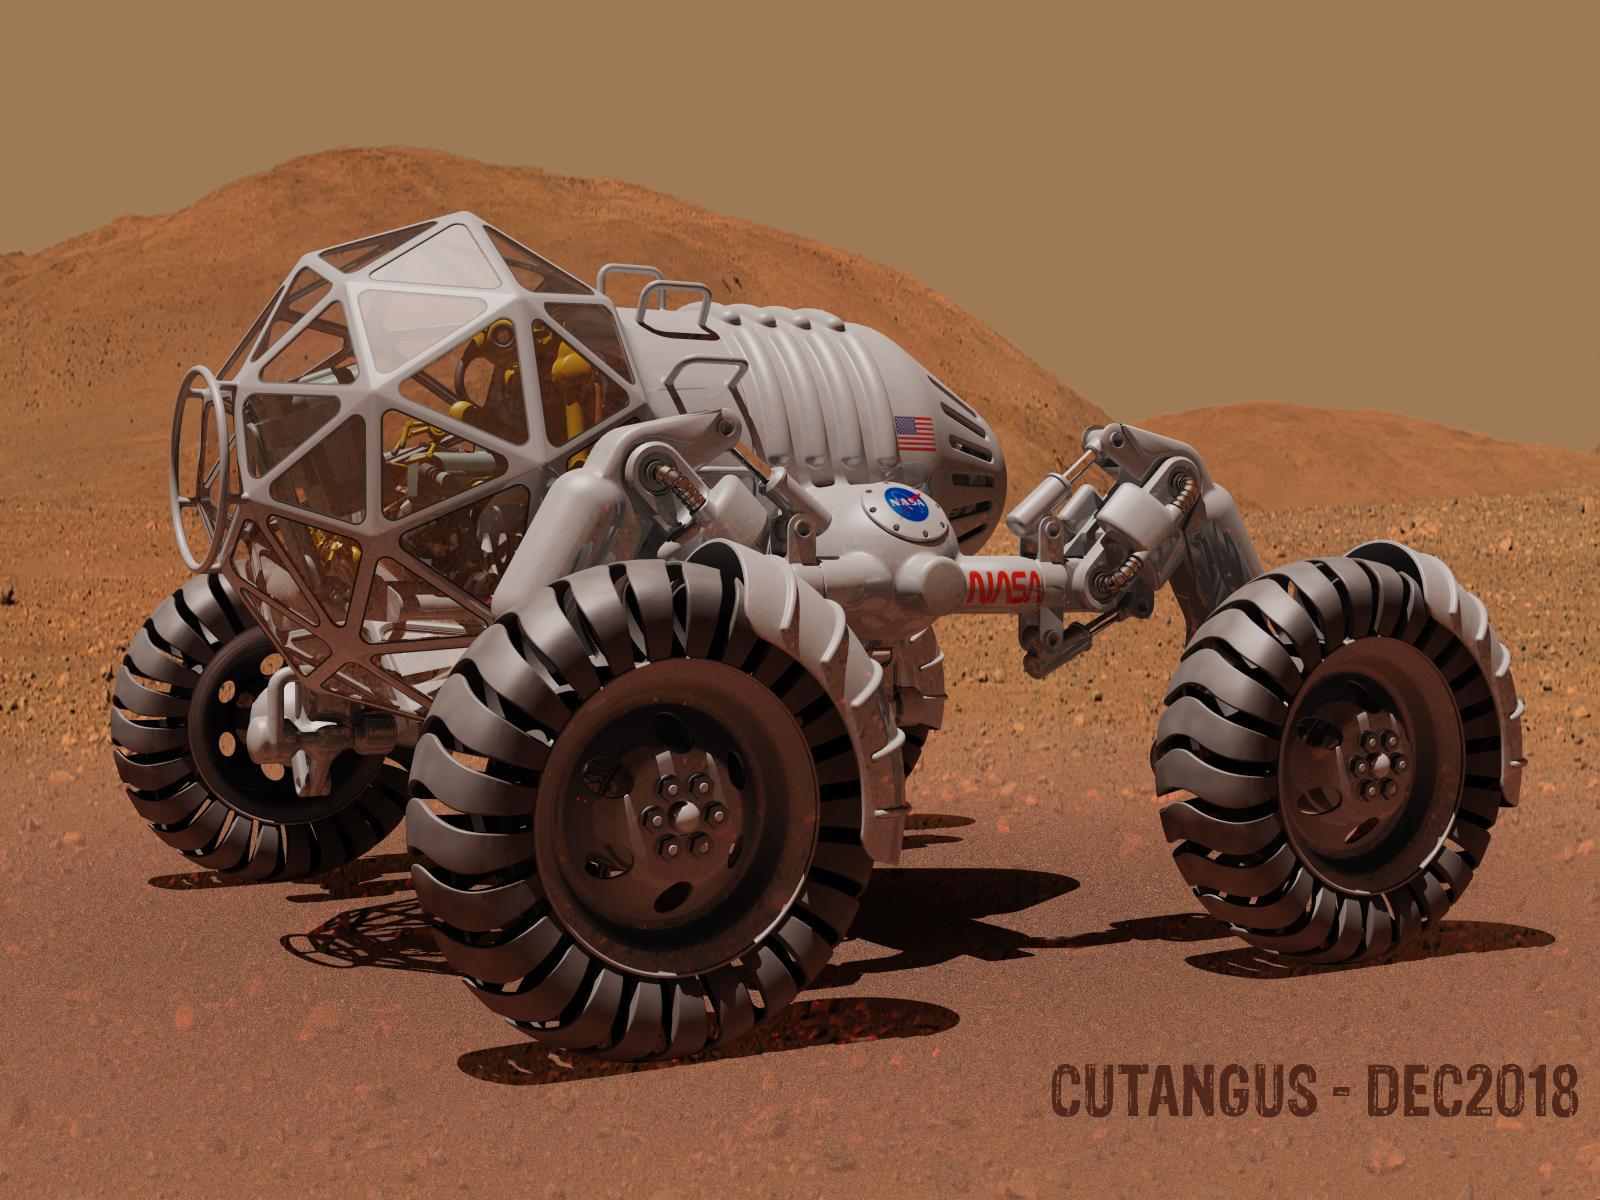 Mars Rover Vehicle (I) by CUTANGUS